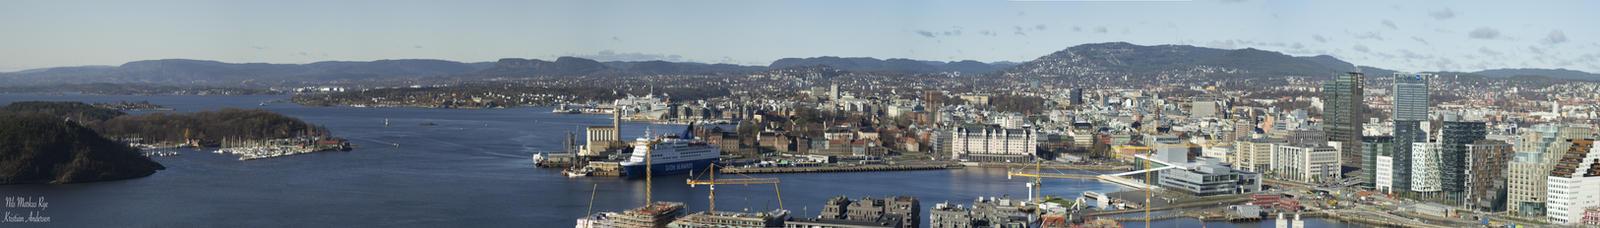 Oslo Panorama by BlackDiamondOne